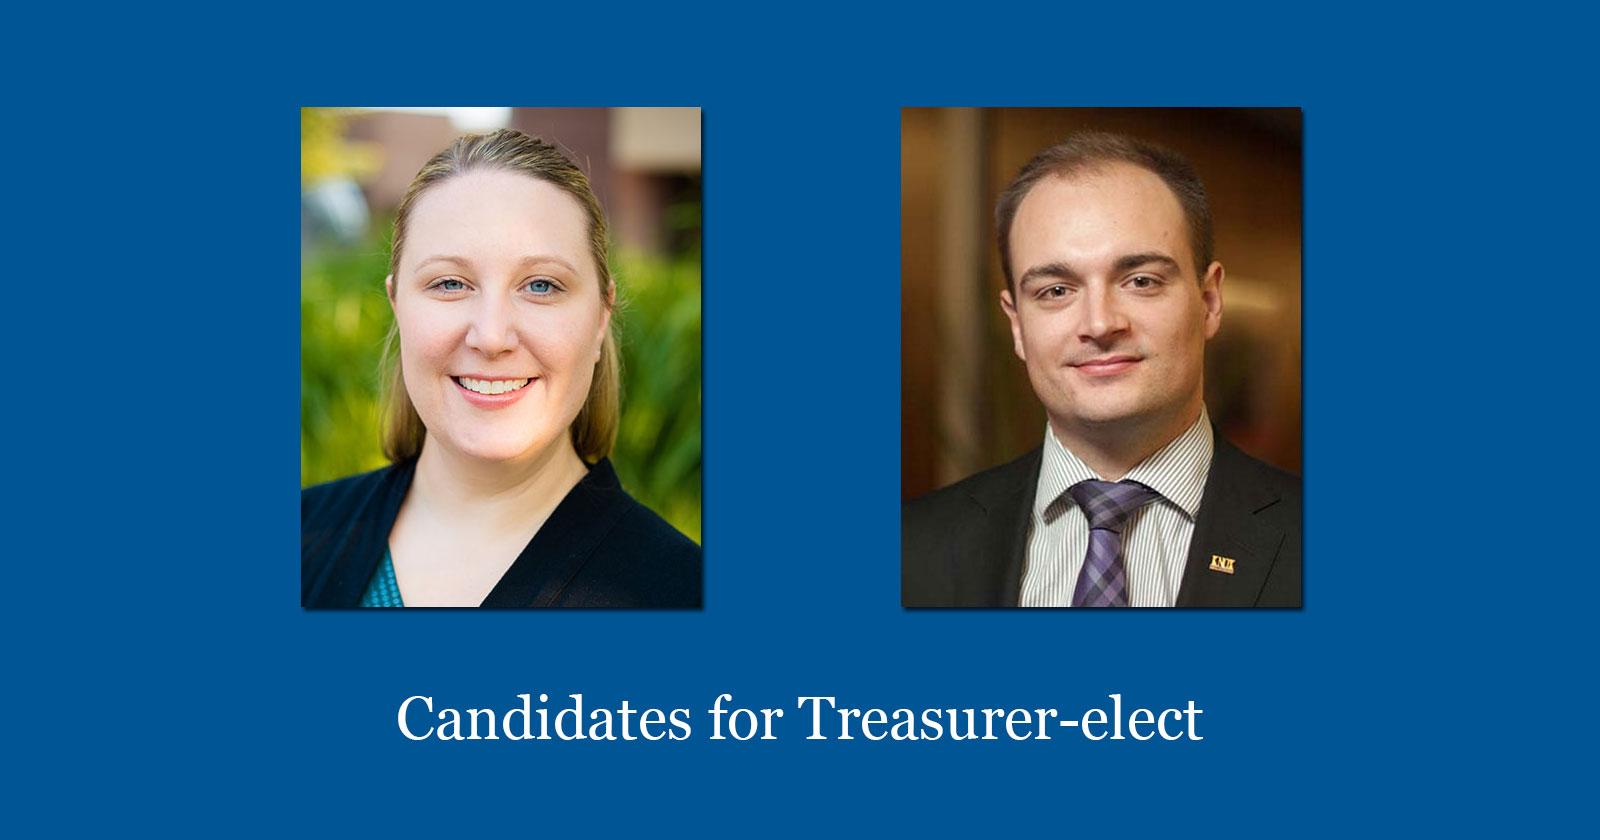 Candidates For Treasurer-elect 2016-2017